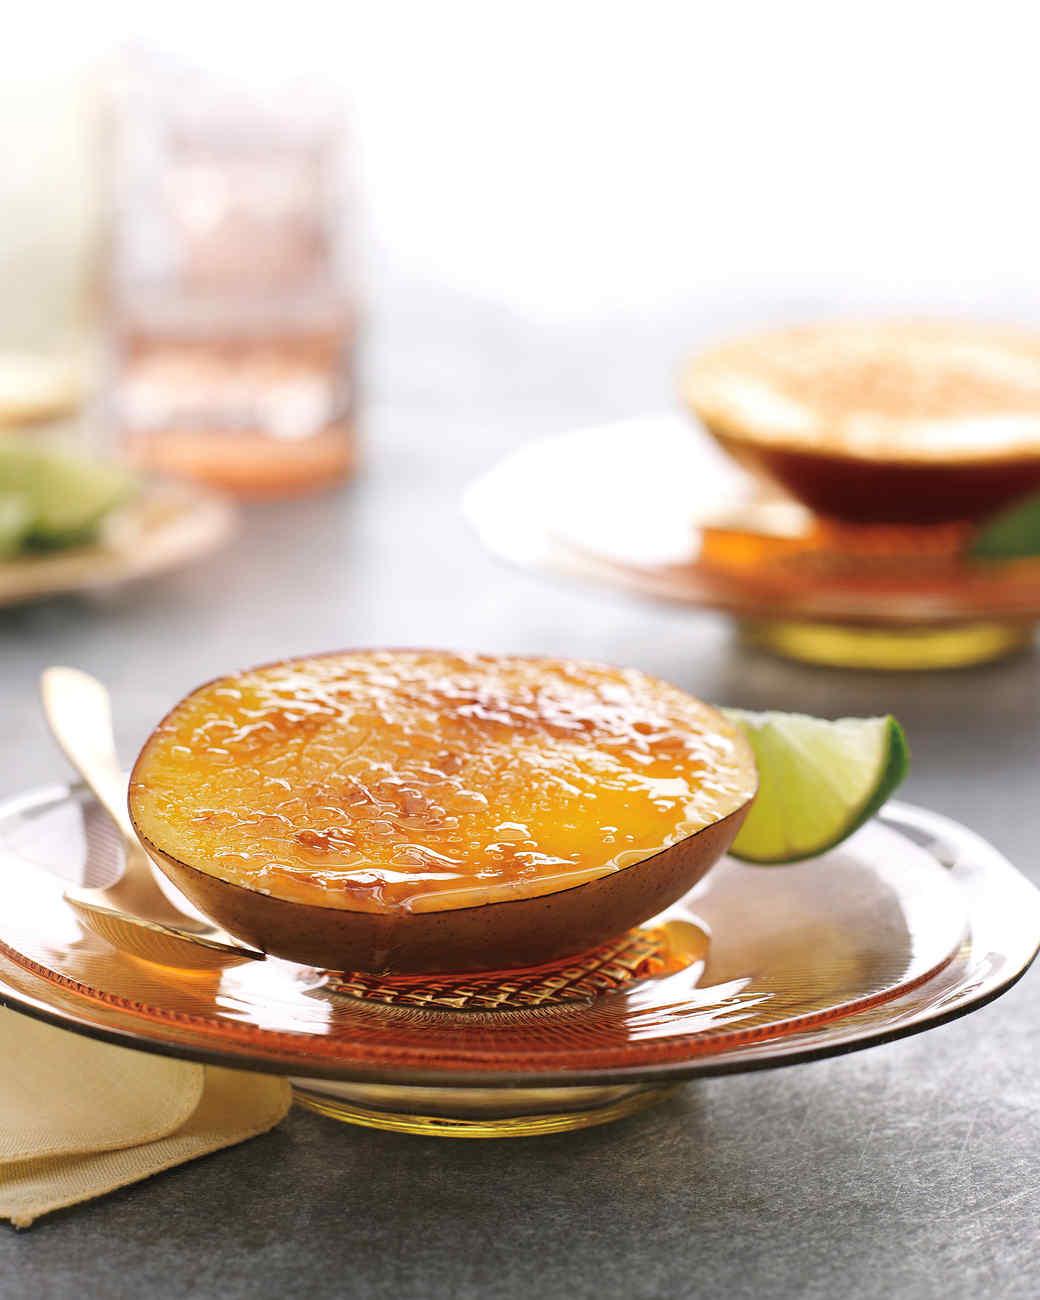 Mango brulee 0911mld107545 vert